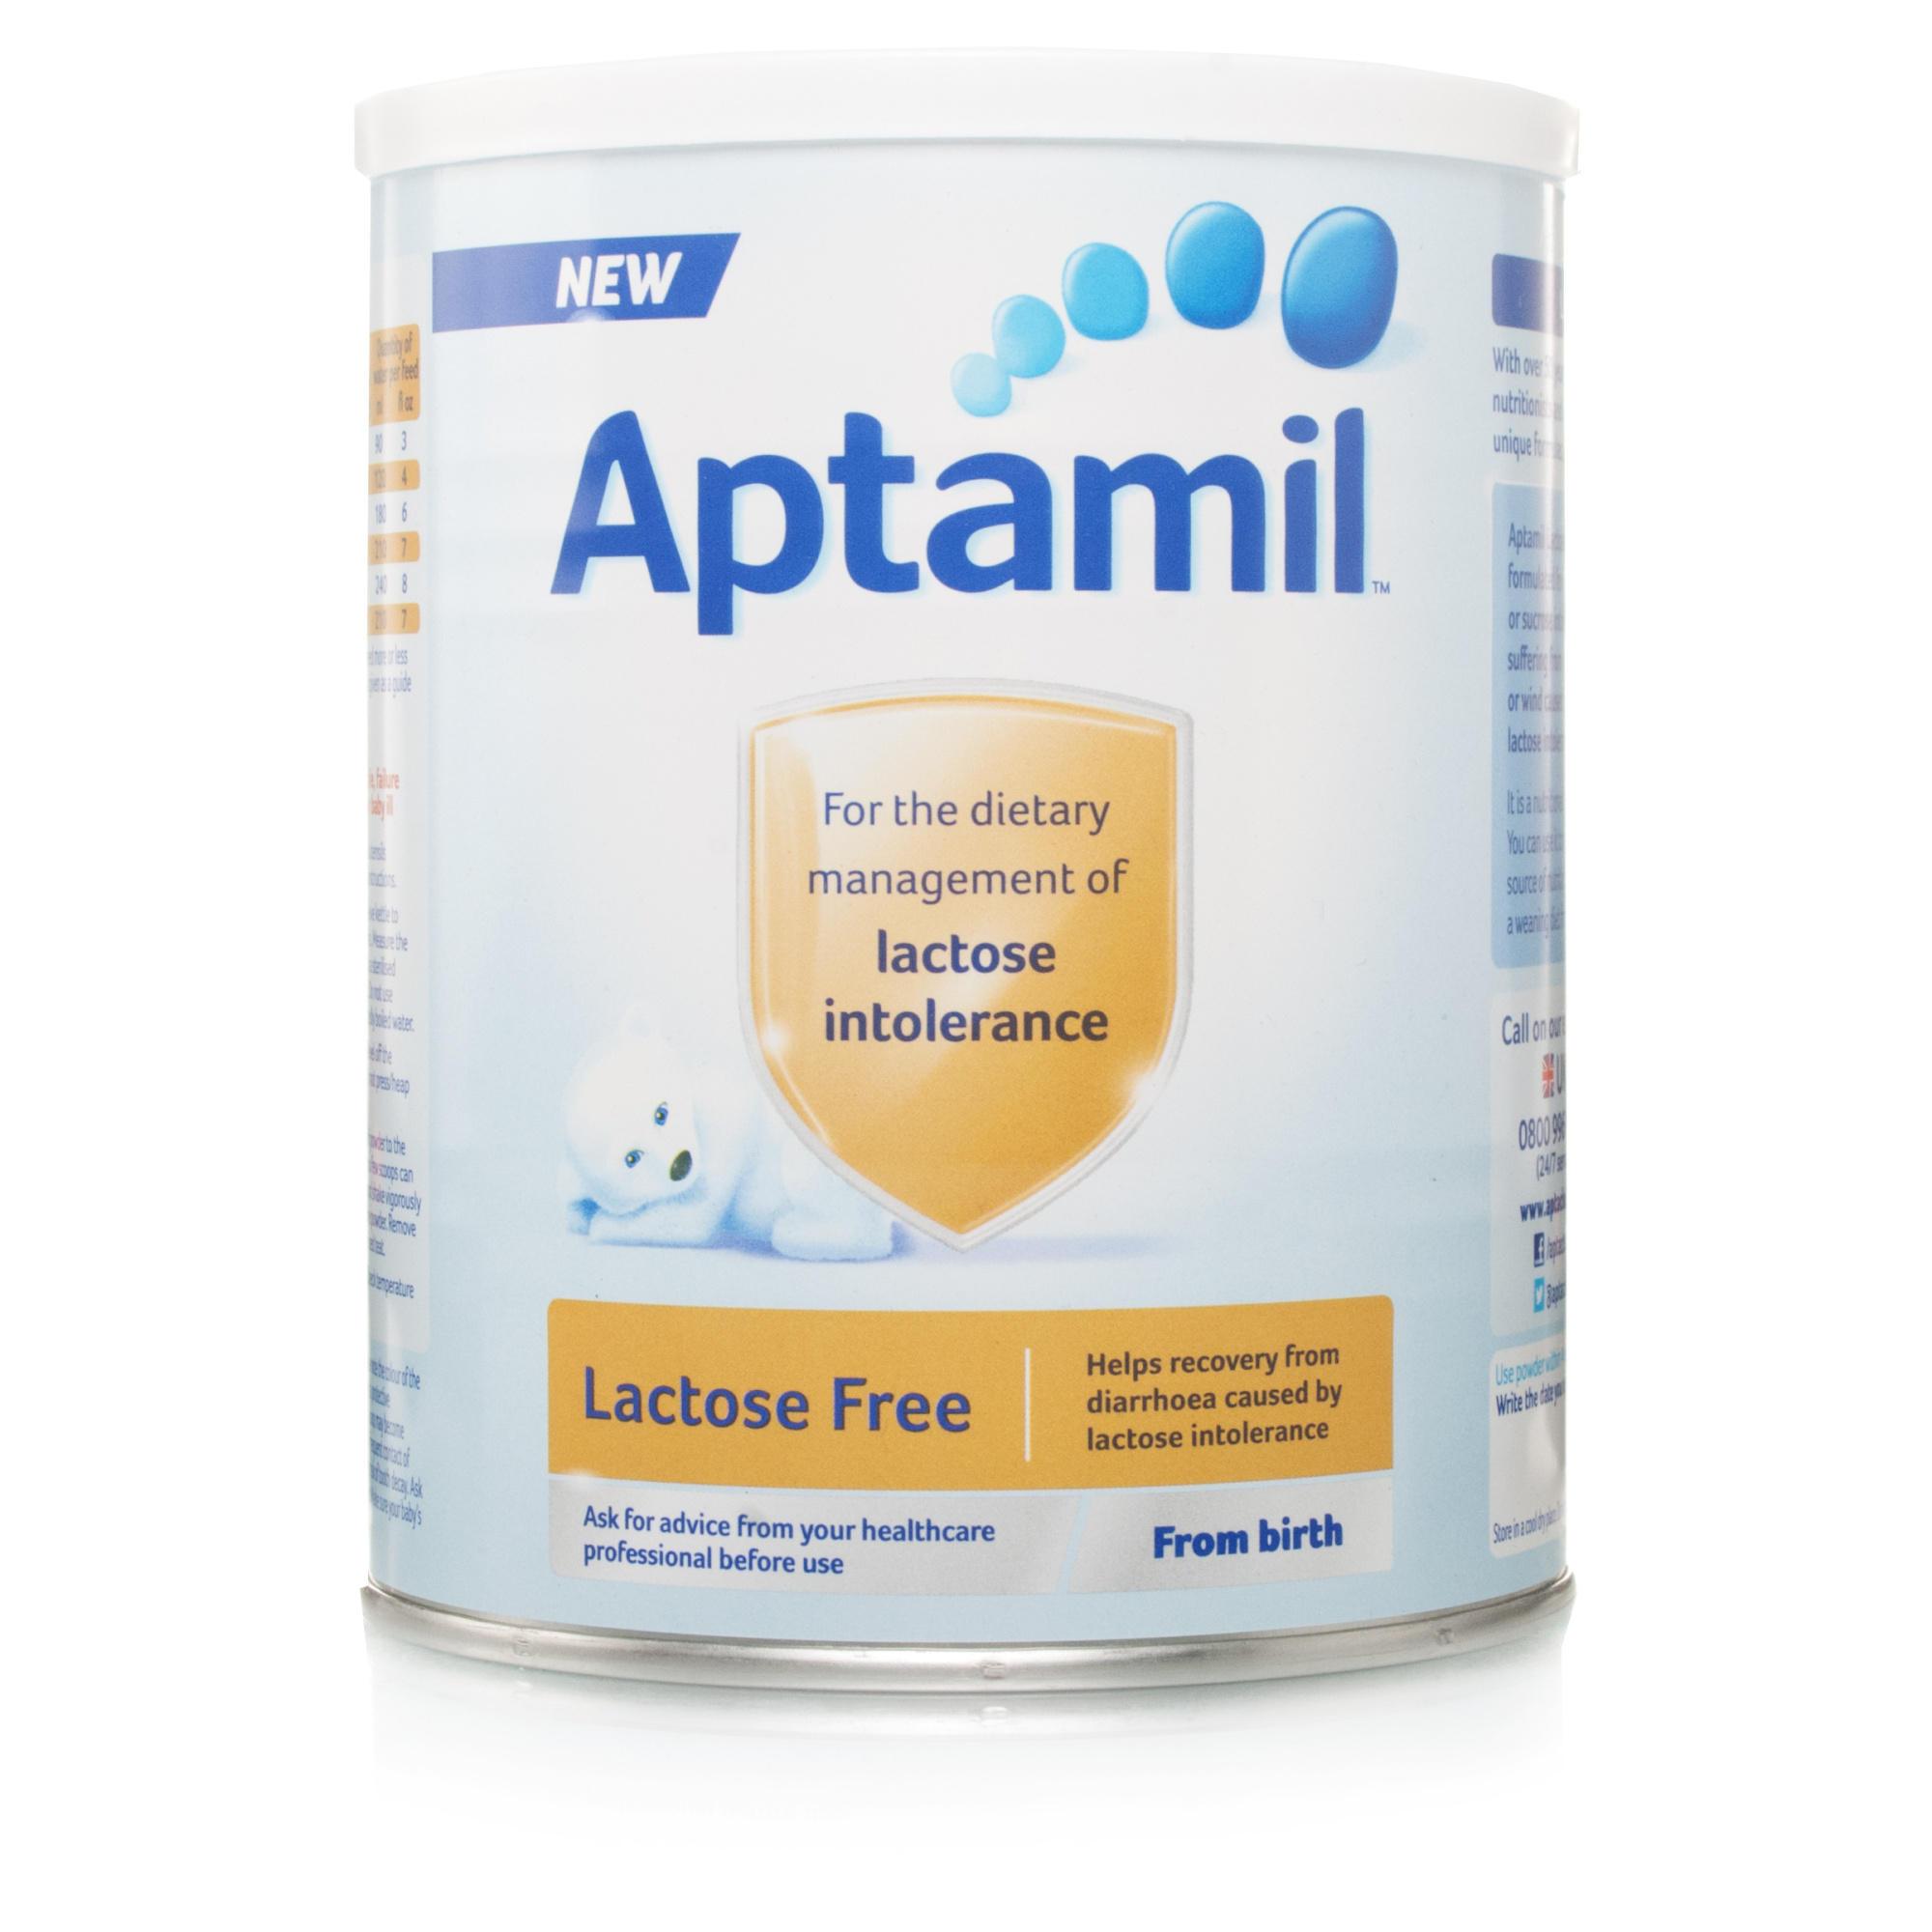 Aptamil Lactose Free Milk Powder